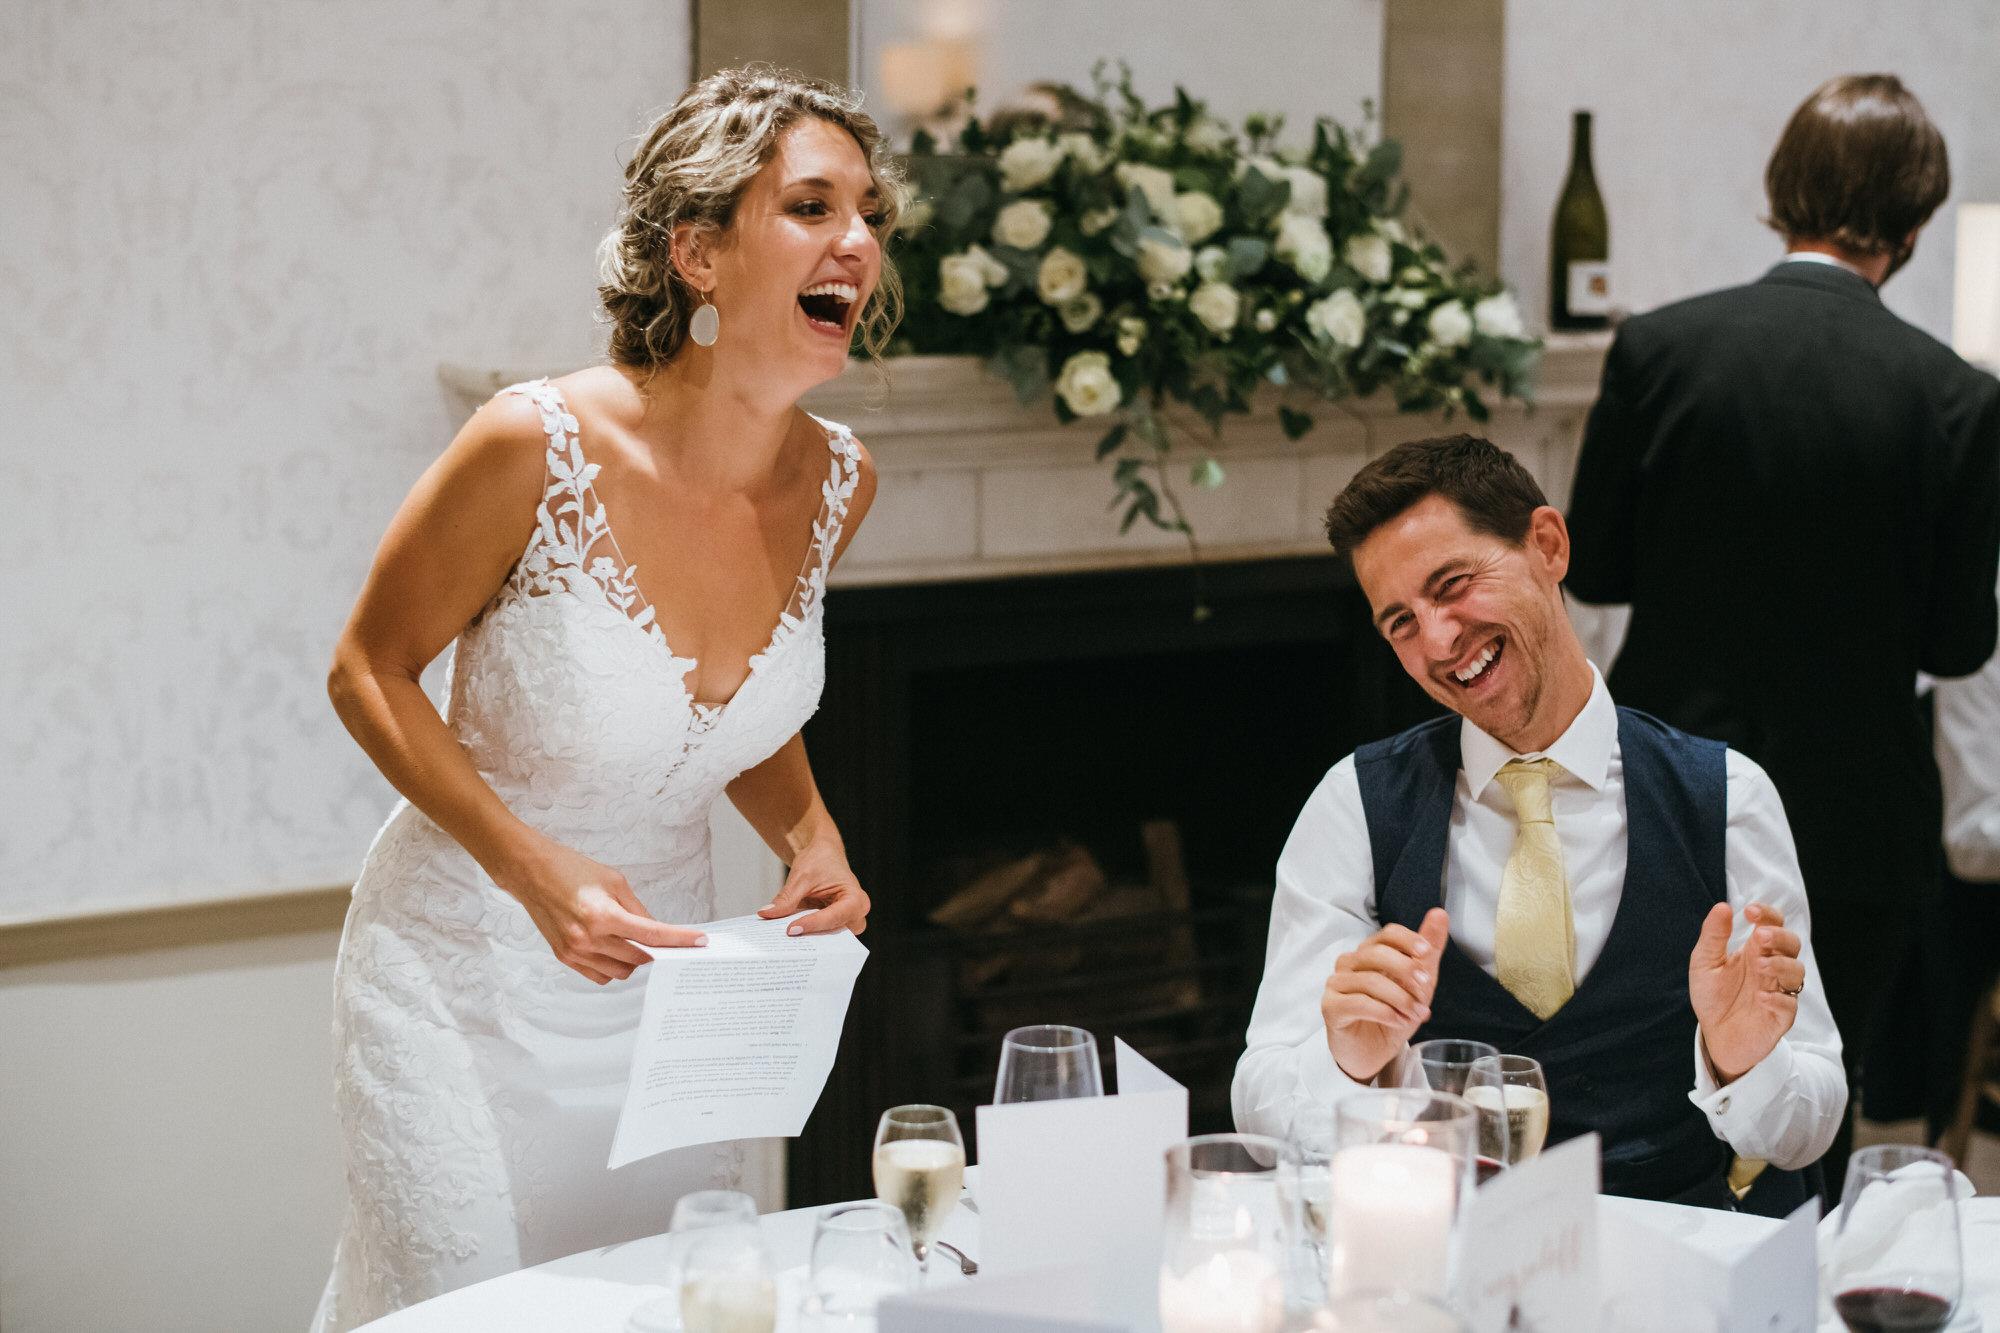 Royal crescent wedding speeches